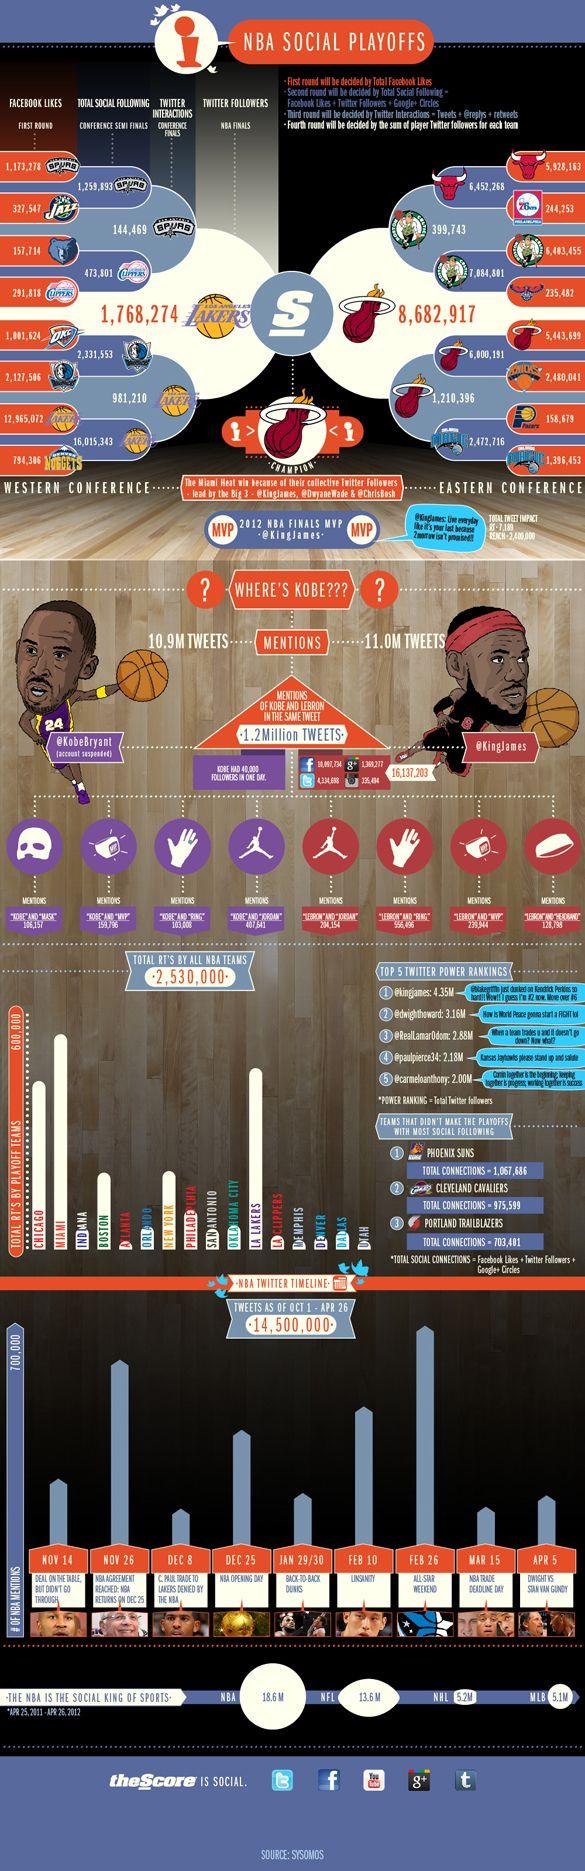 #NBA Social Playoffs #Infographic